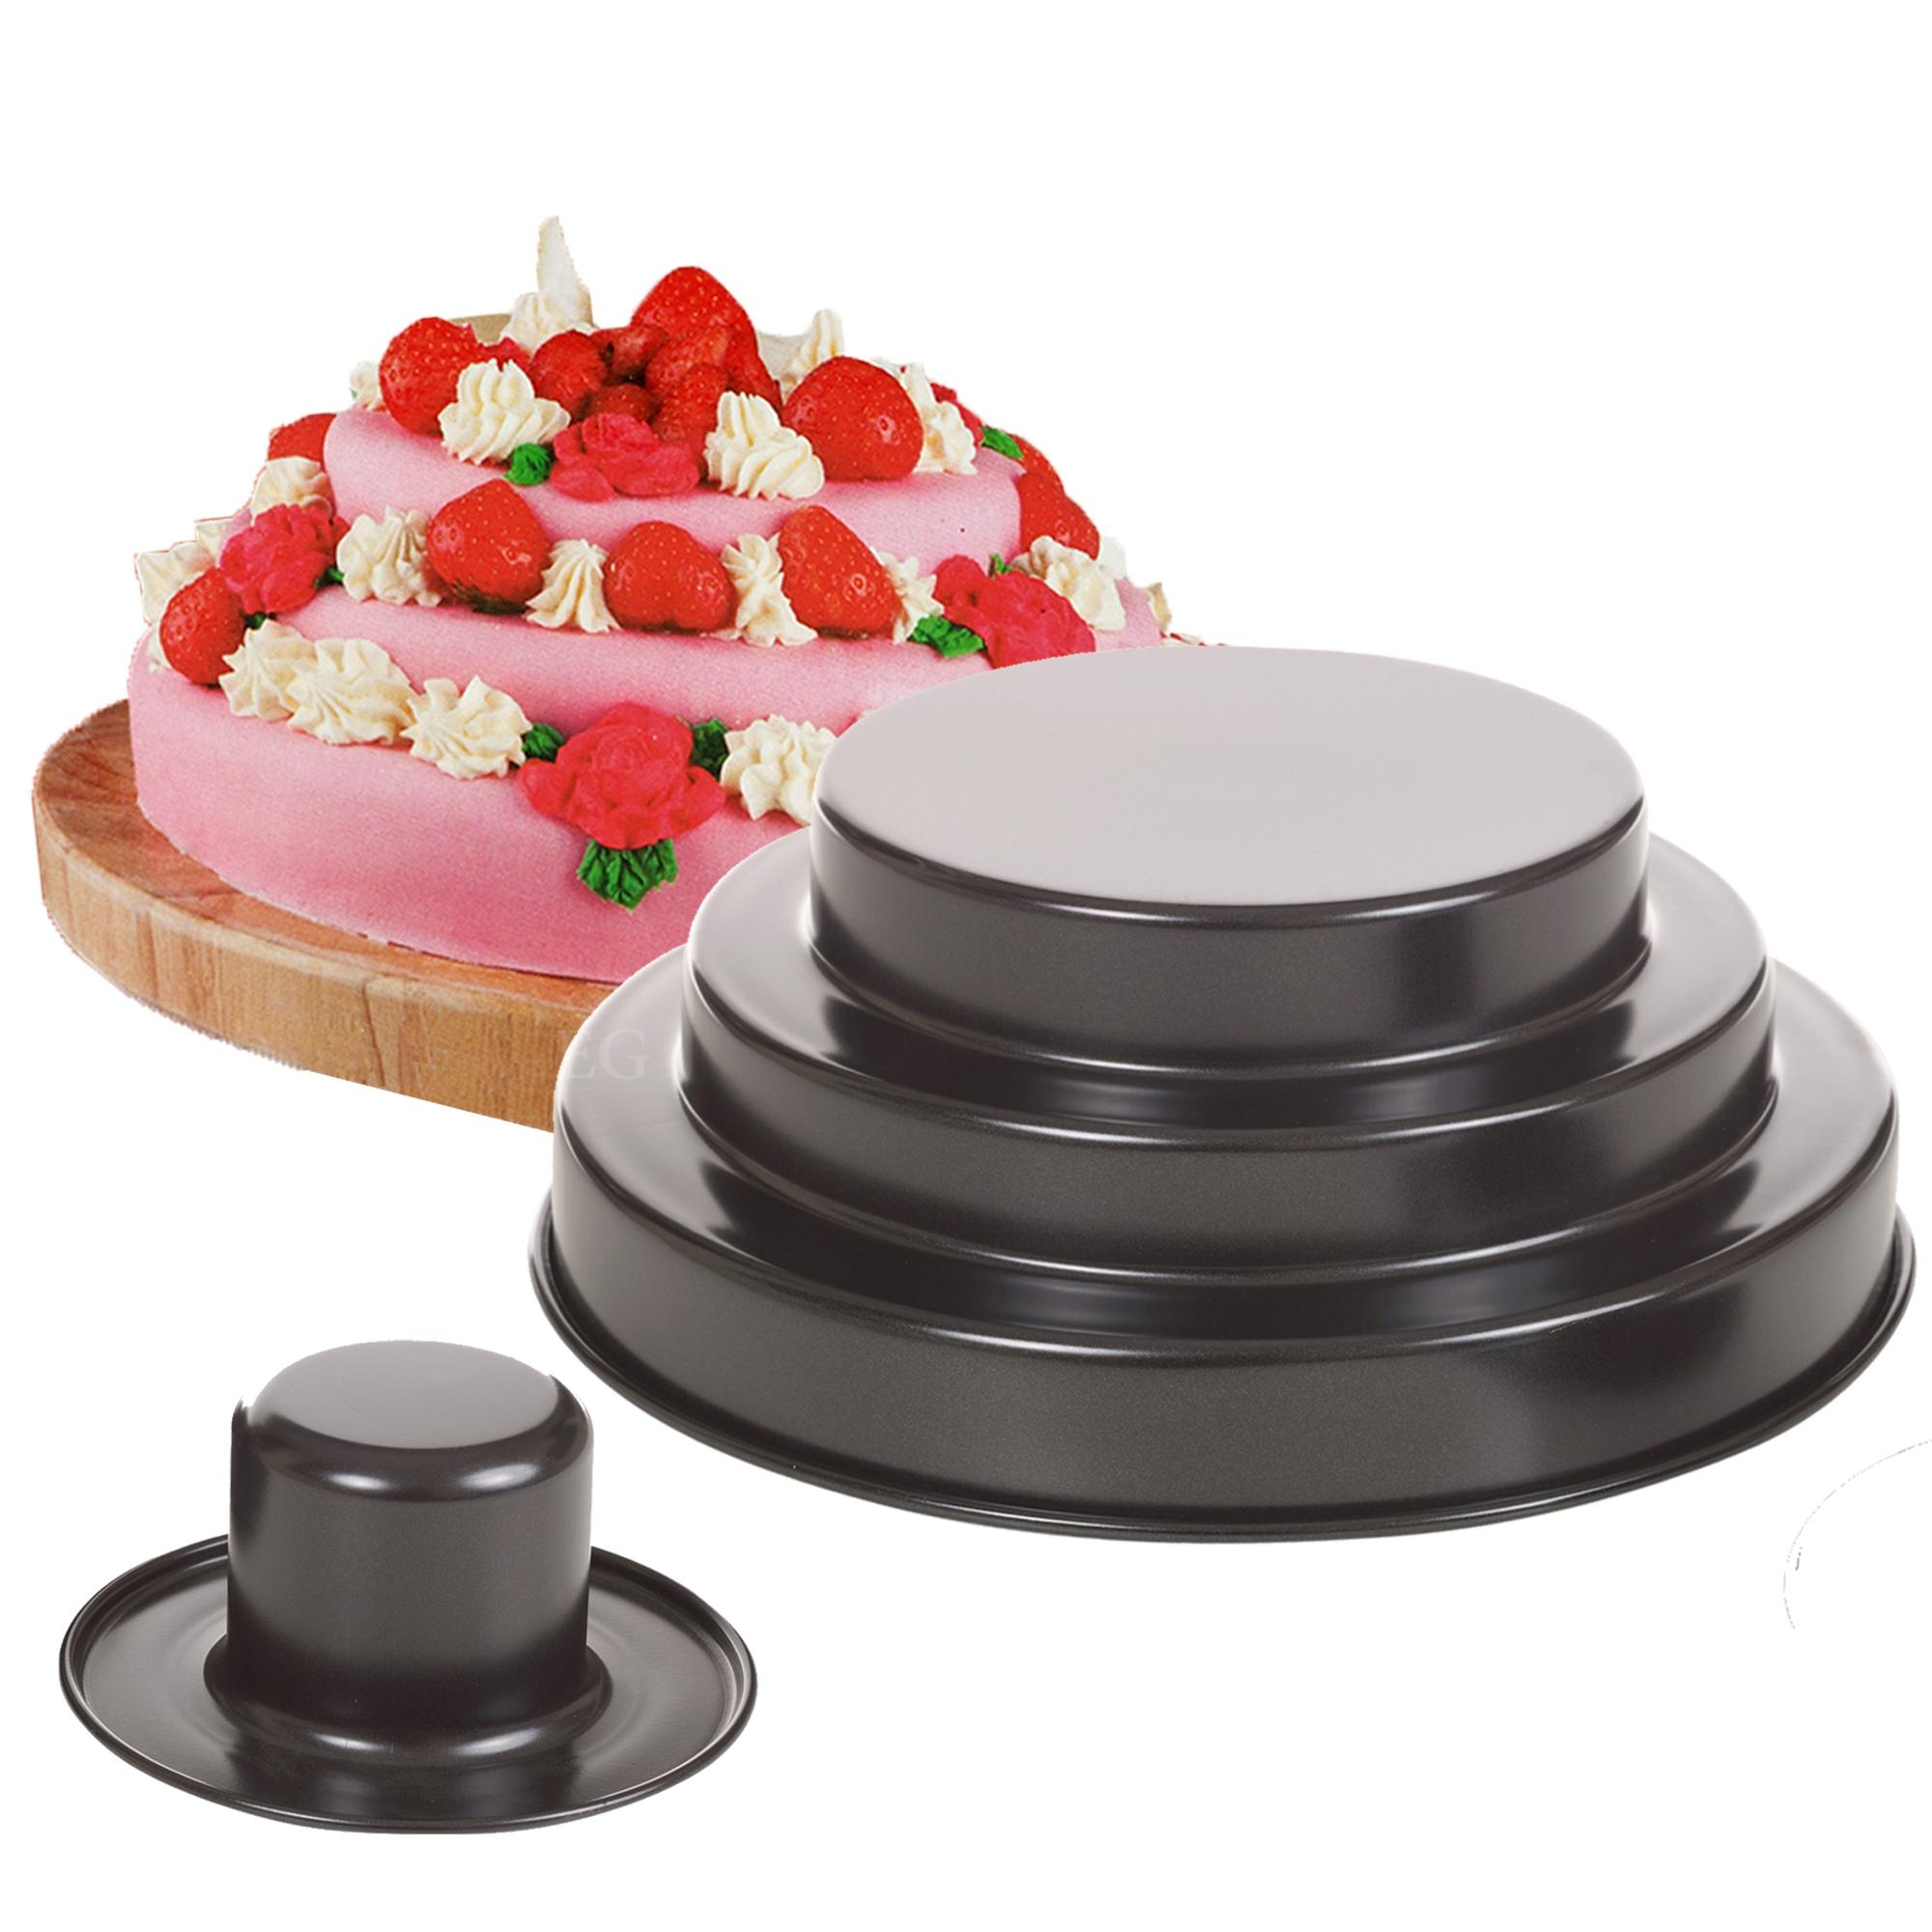 3 tier layered birthday wedding cake non stick mould cake pan deep baking tin ebay. Black Bedroom Furniture Sets. Home Design Ideas